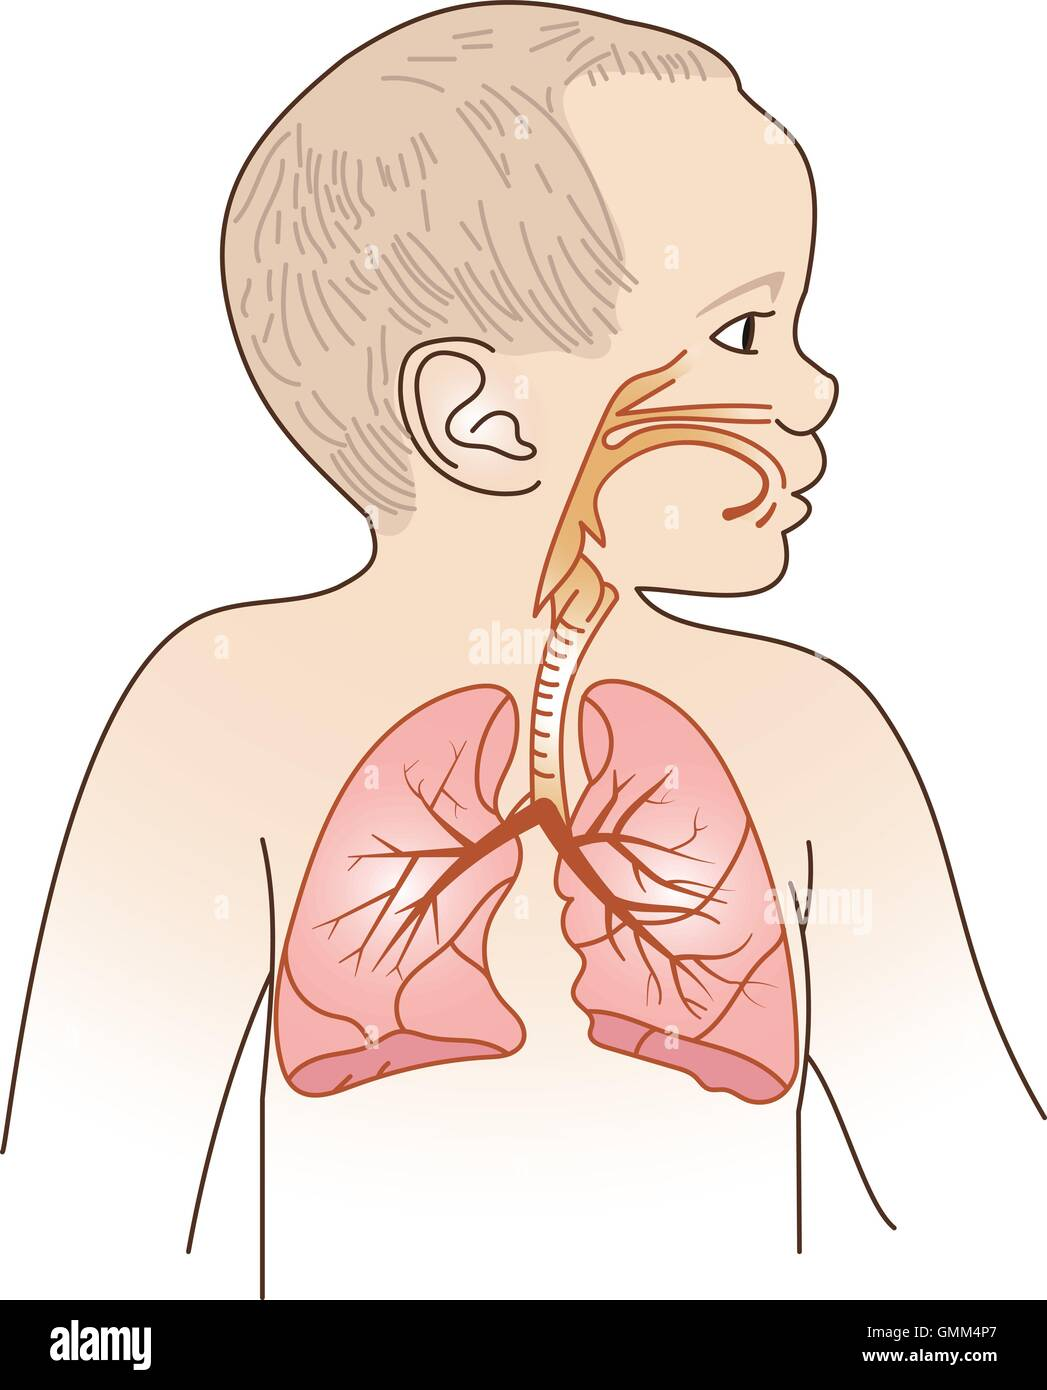 Child Respiratory Scheme - Stock Image